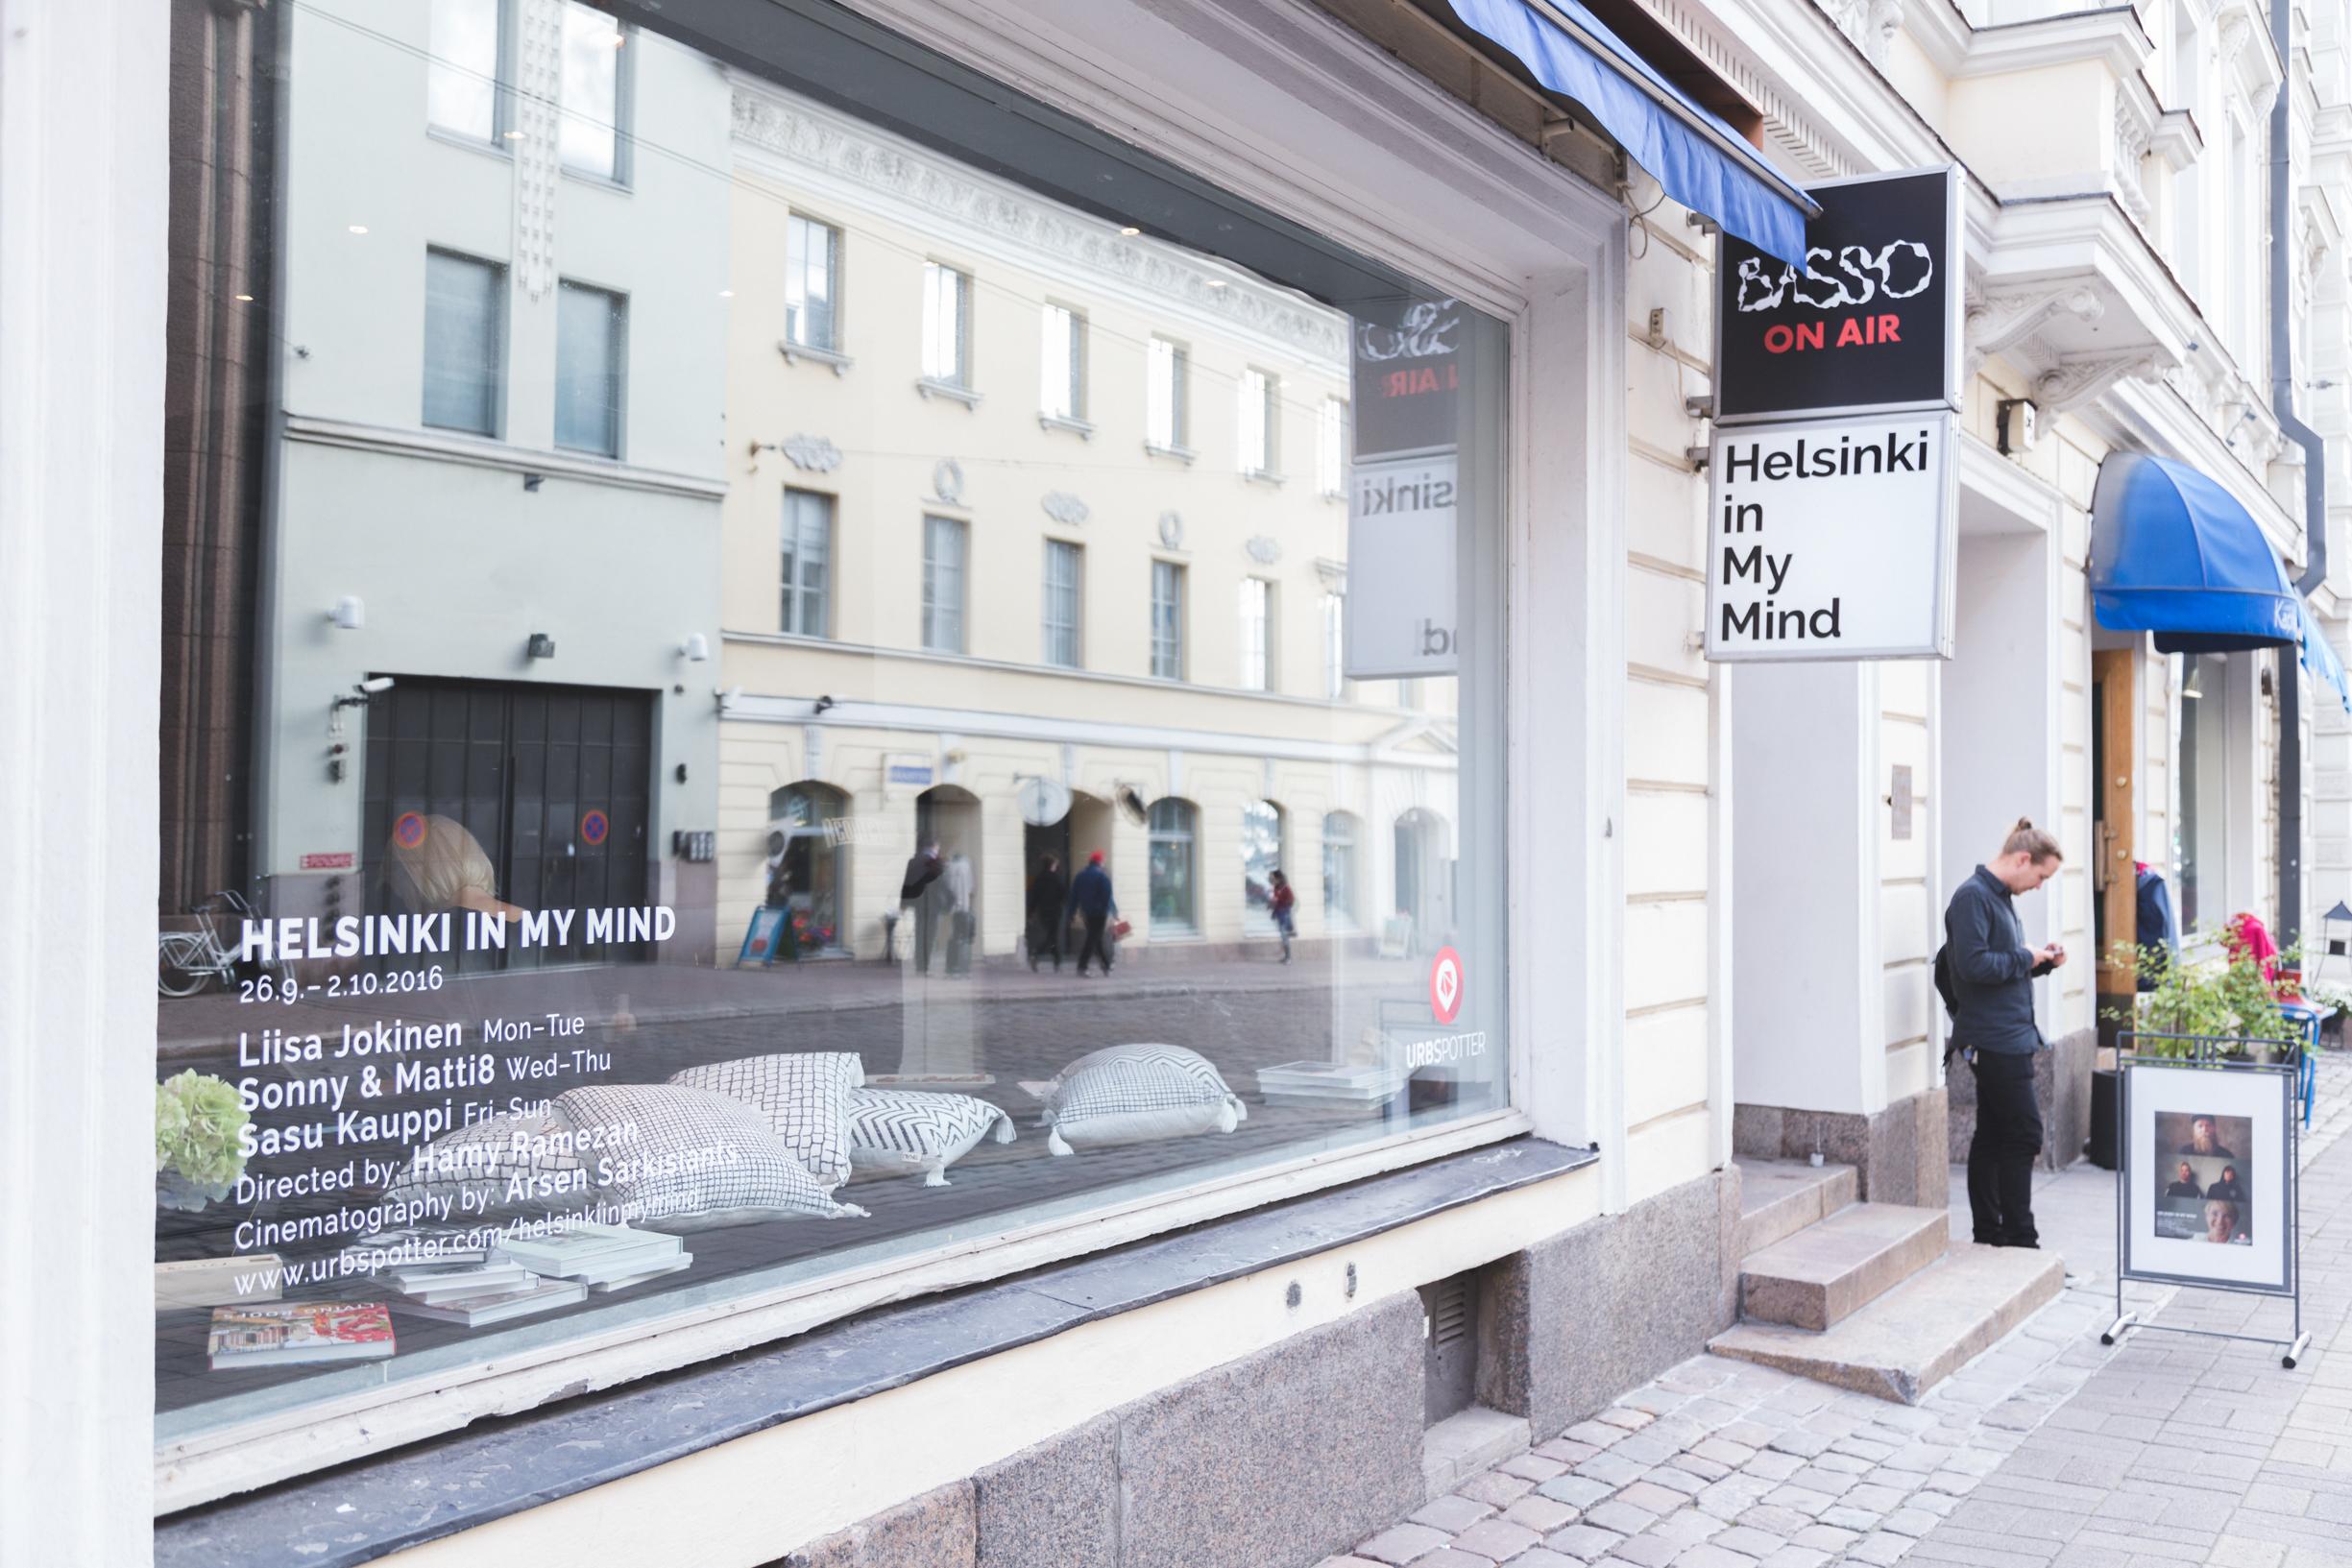 himm-liisa-jokinen-2384